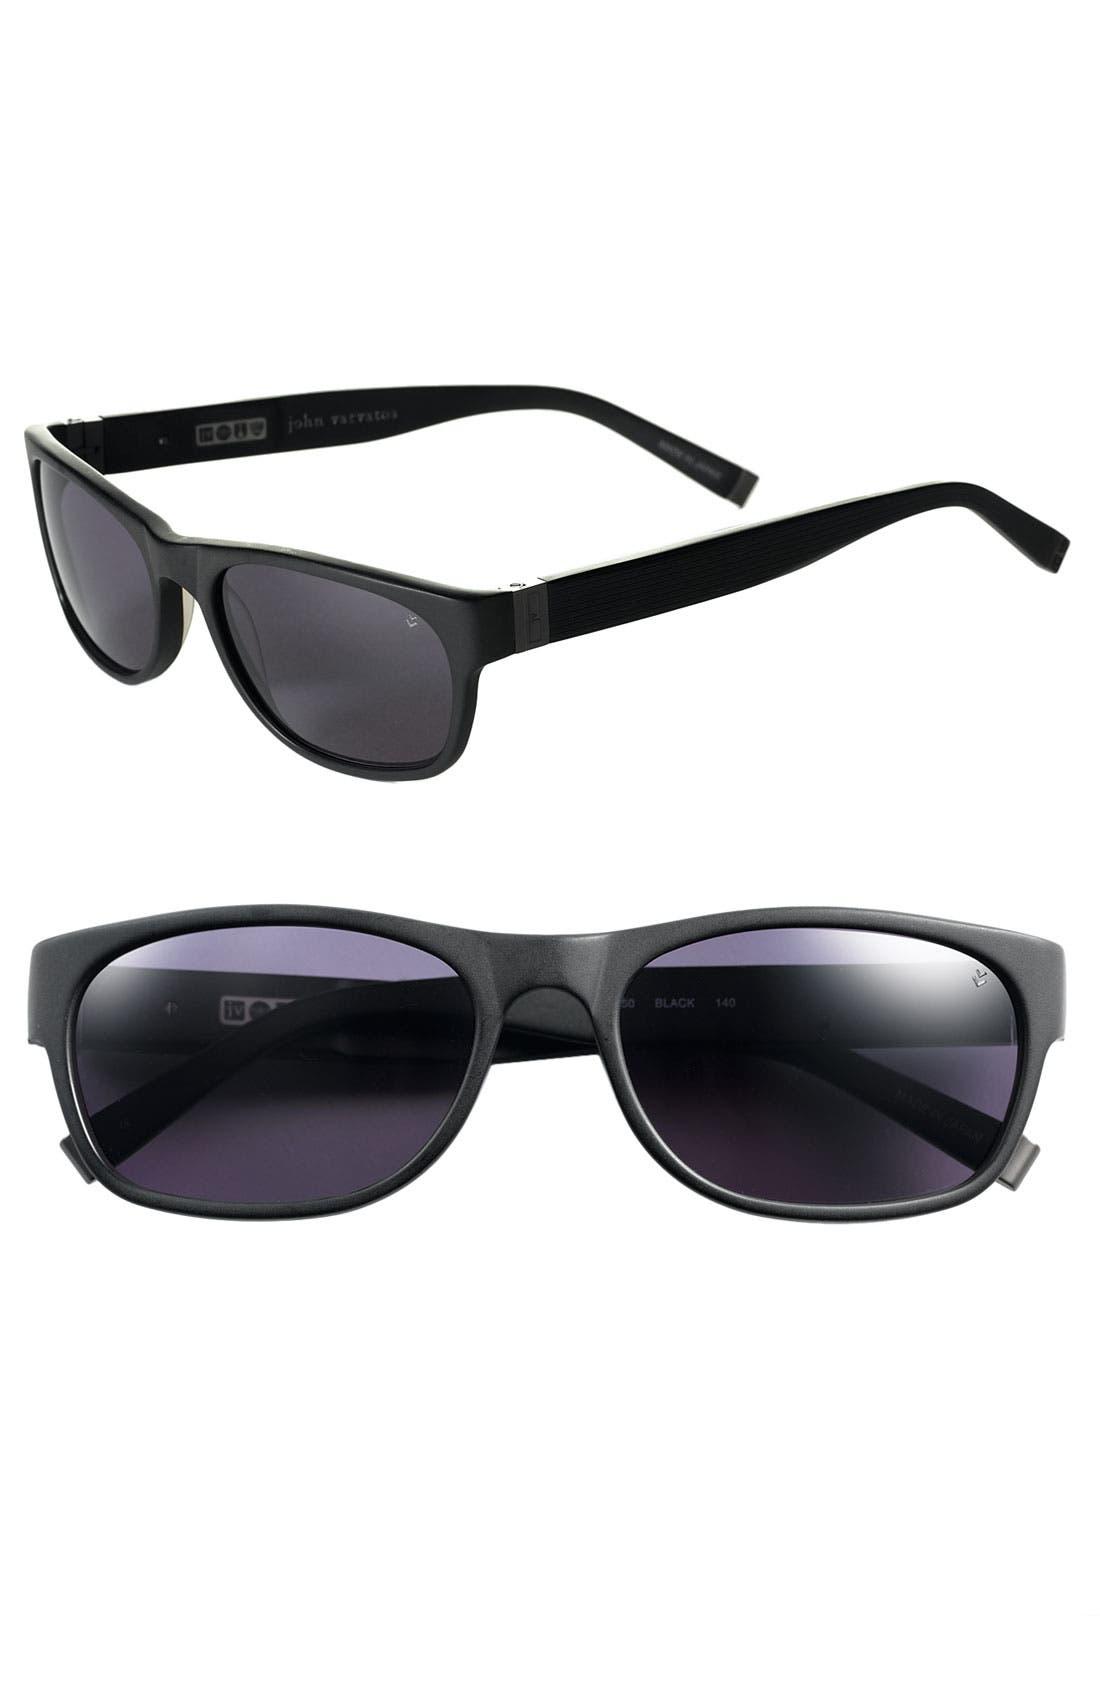 Main Image - John Varvatos Collection 'Swirl' Plastic Sunglasses